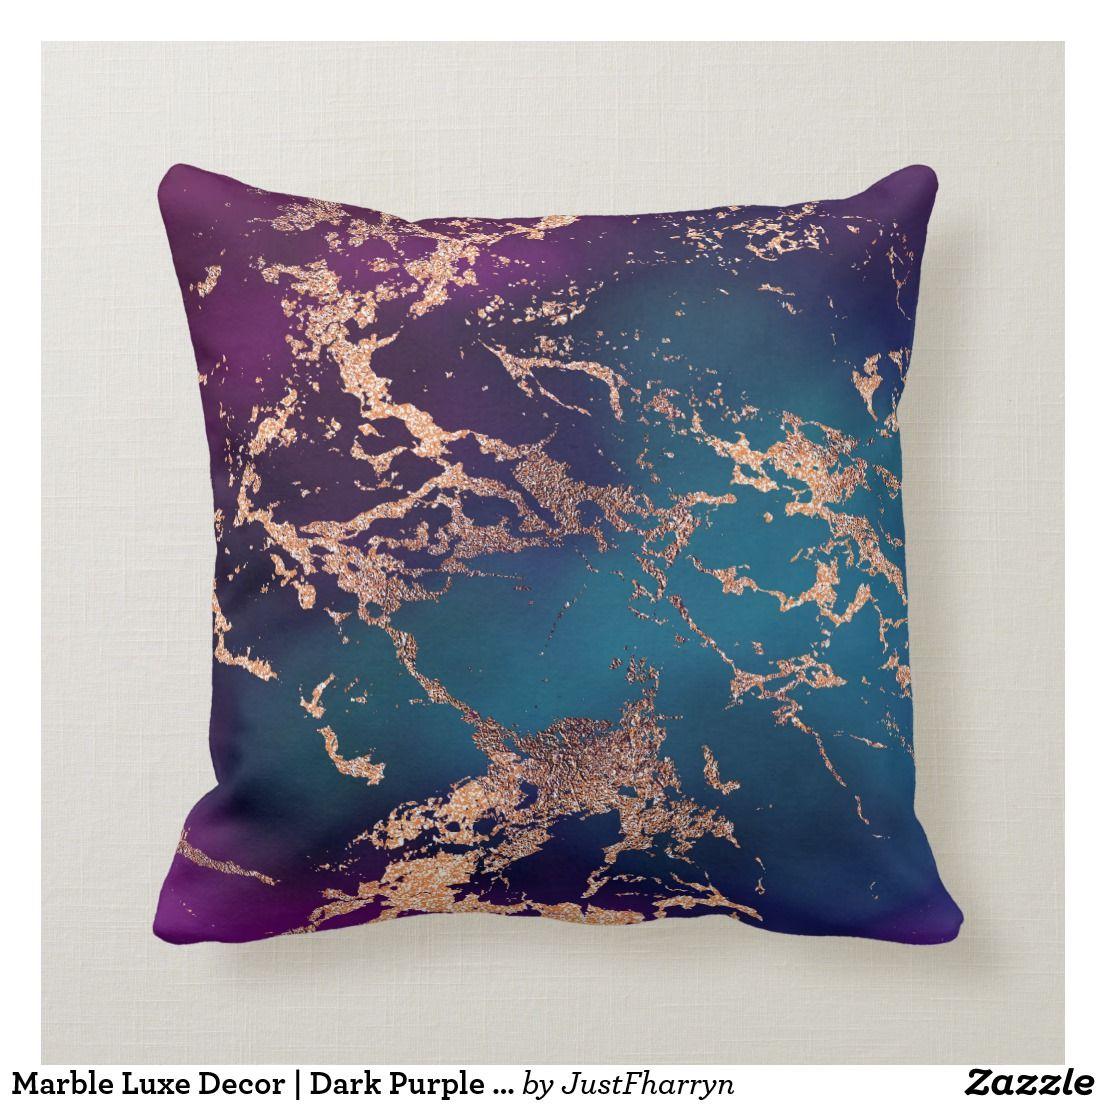 Moody Marble Decor | Luxe Deep Purple Teal Gold Throw Pillow | Zazzle.com -   16 room decor Purple blue ideas